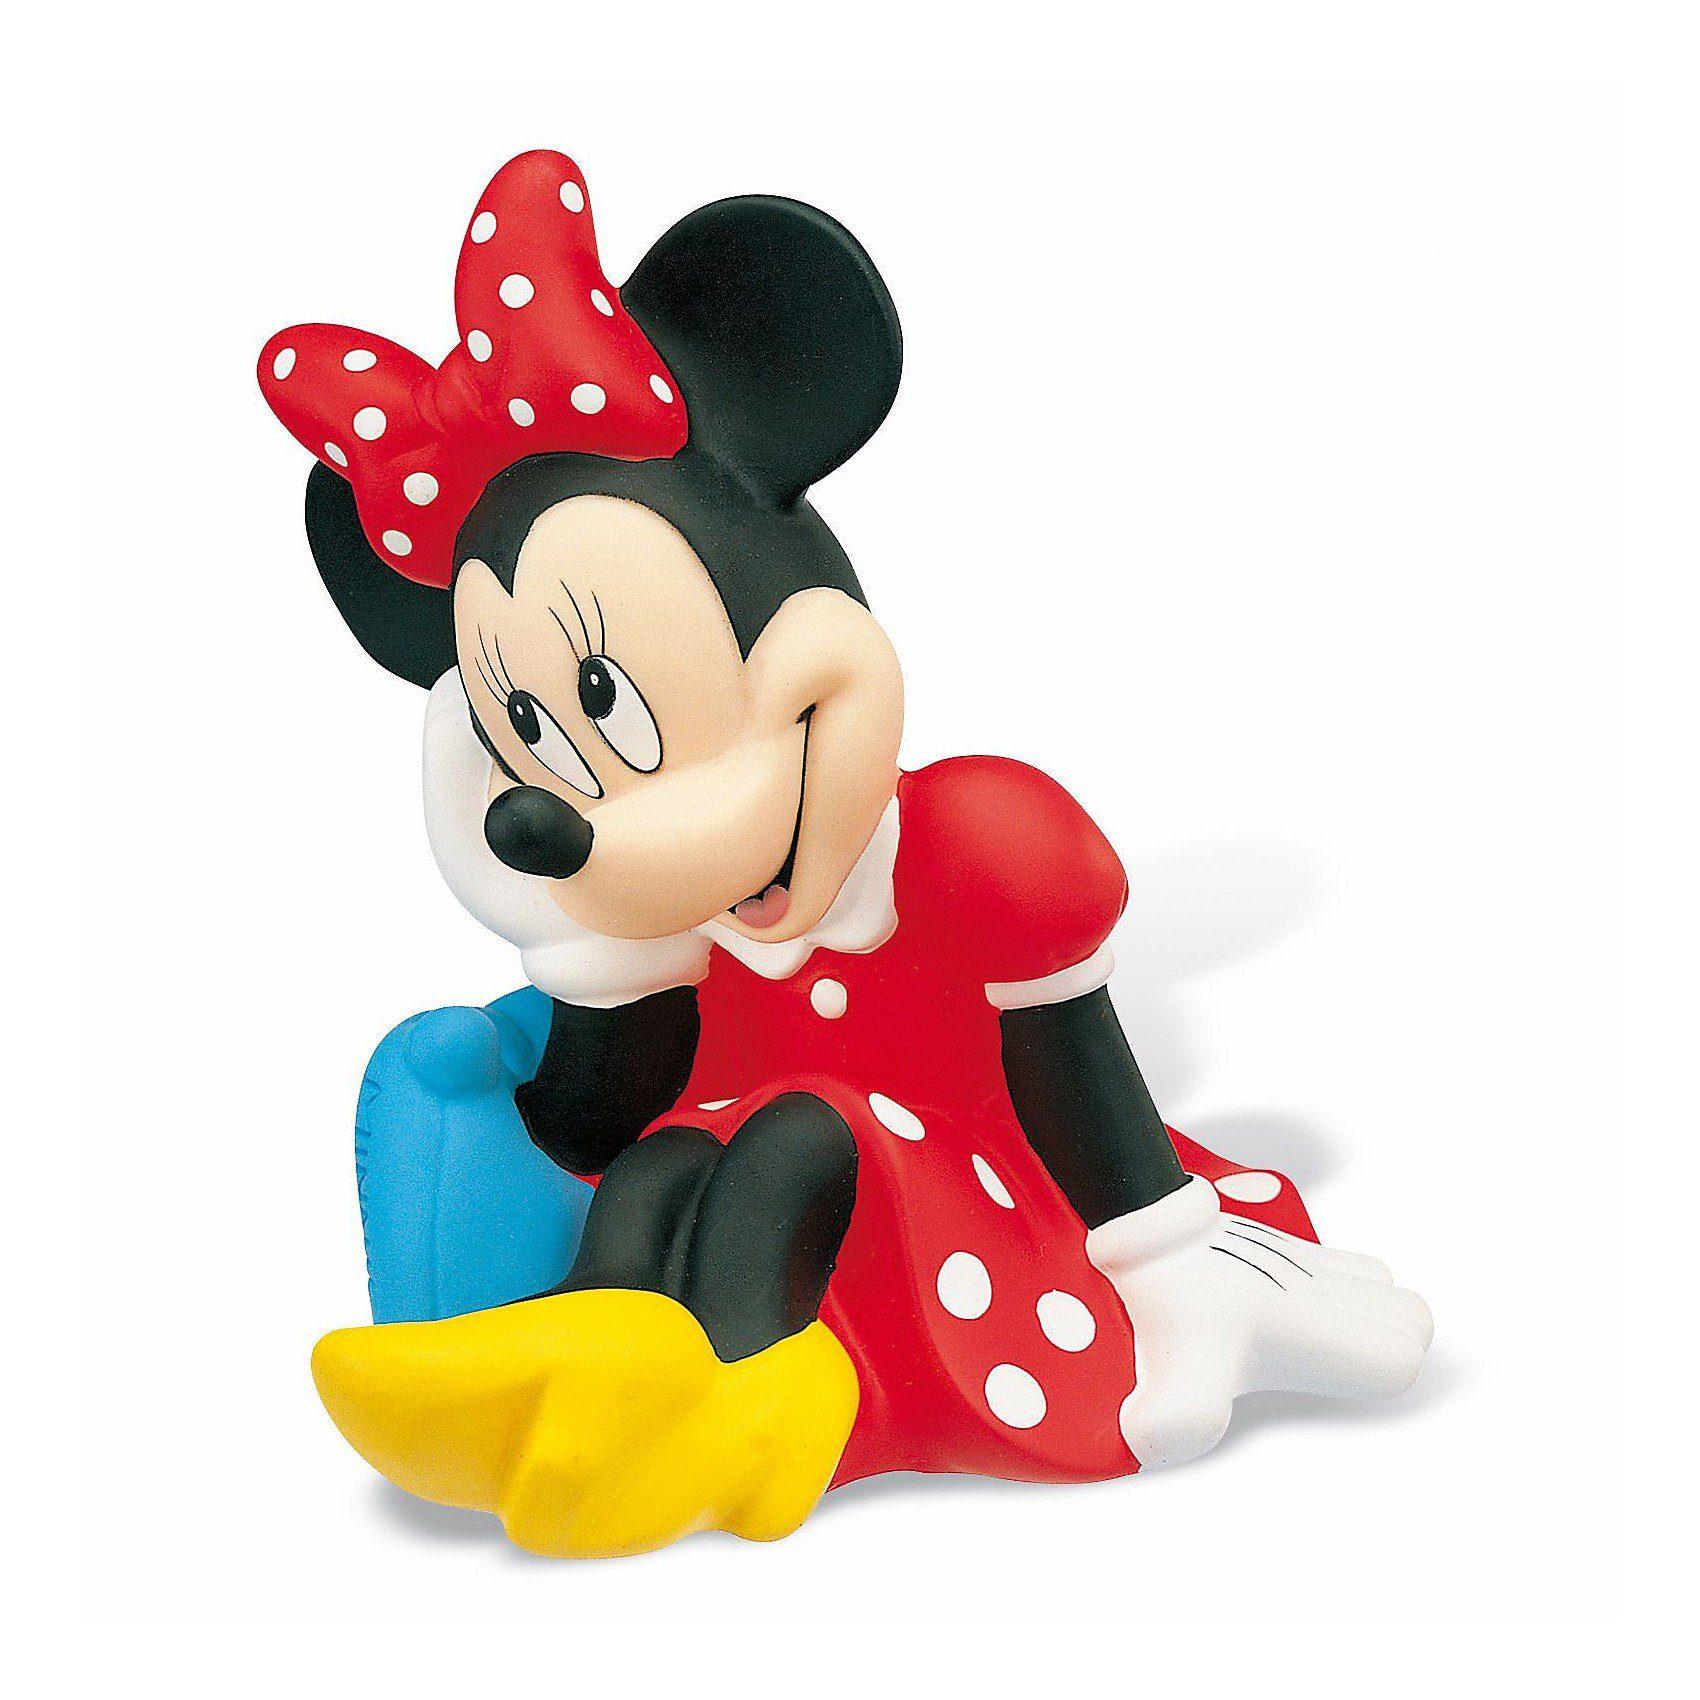 BULLYLAND Spardose Walt Disney - Minnie Maus